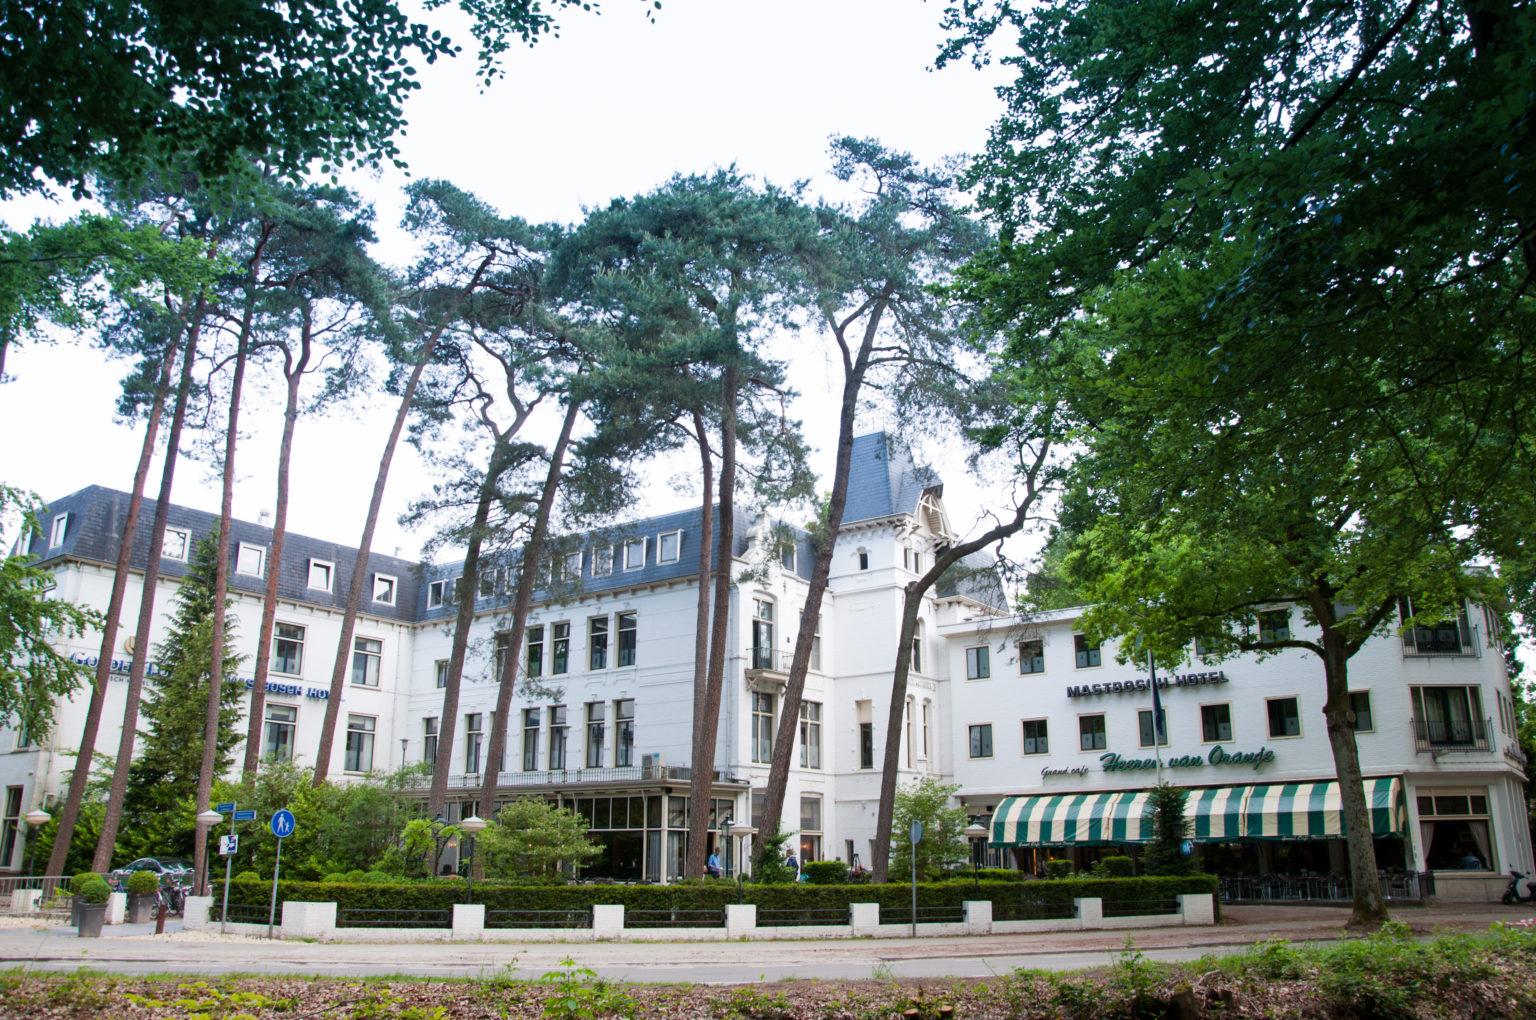 Hotel Mastbosch Breda